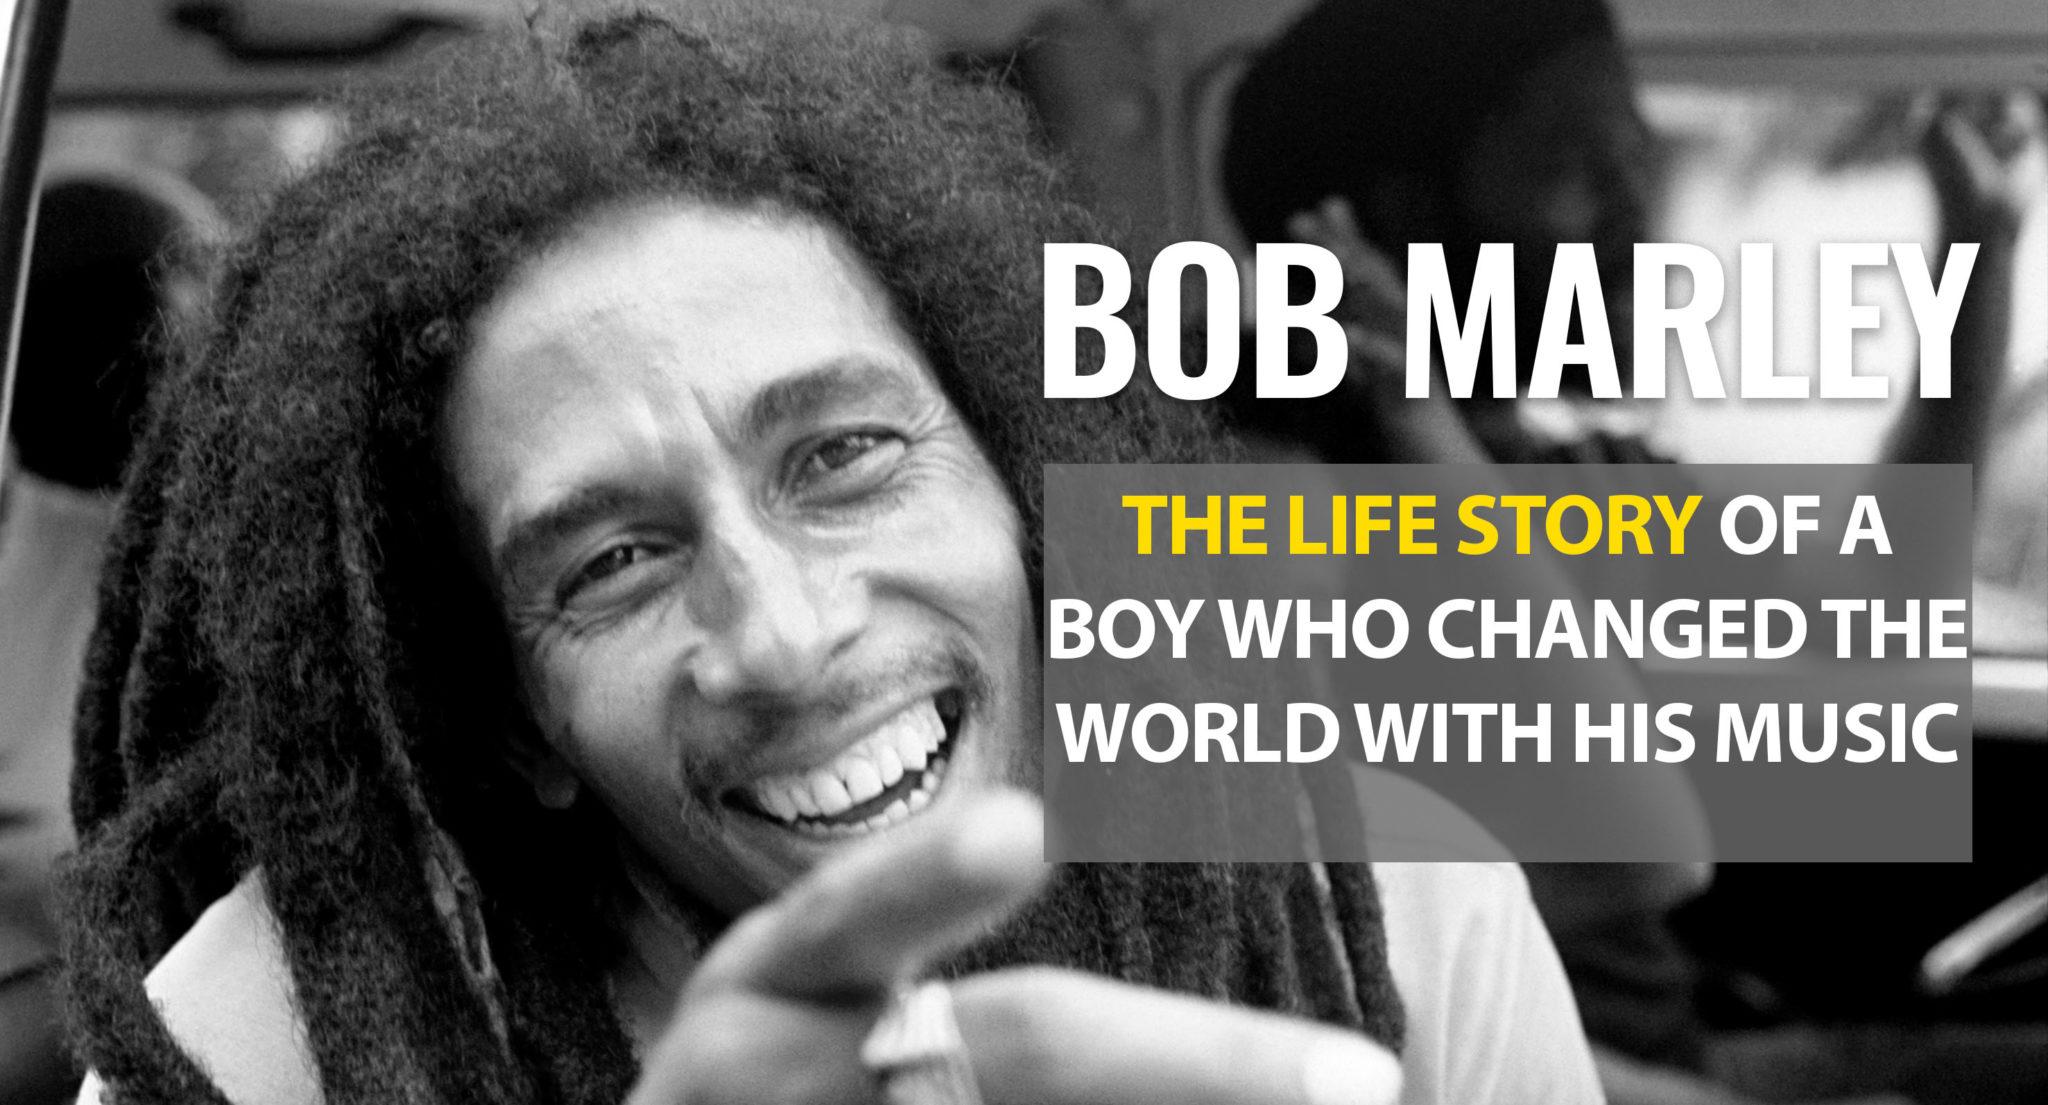 Bob-marley-life-story